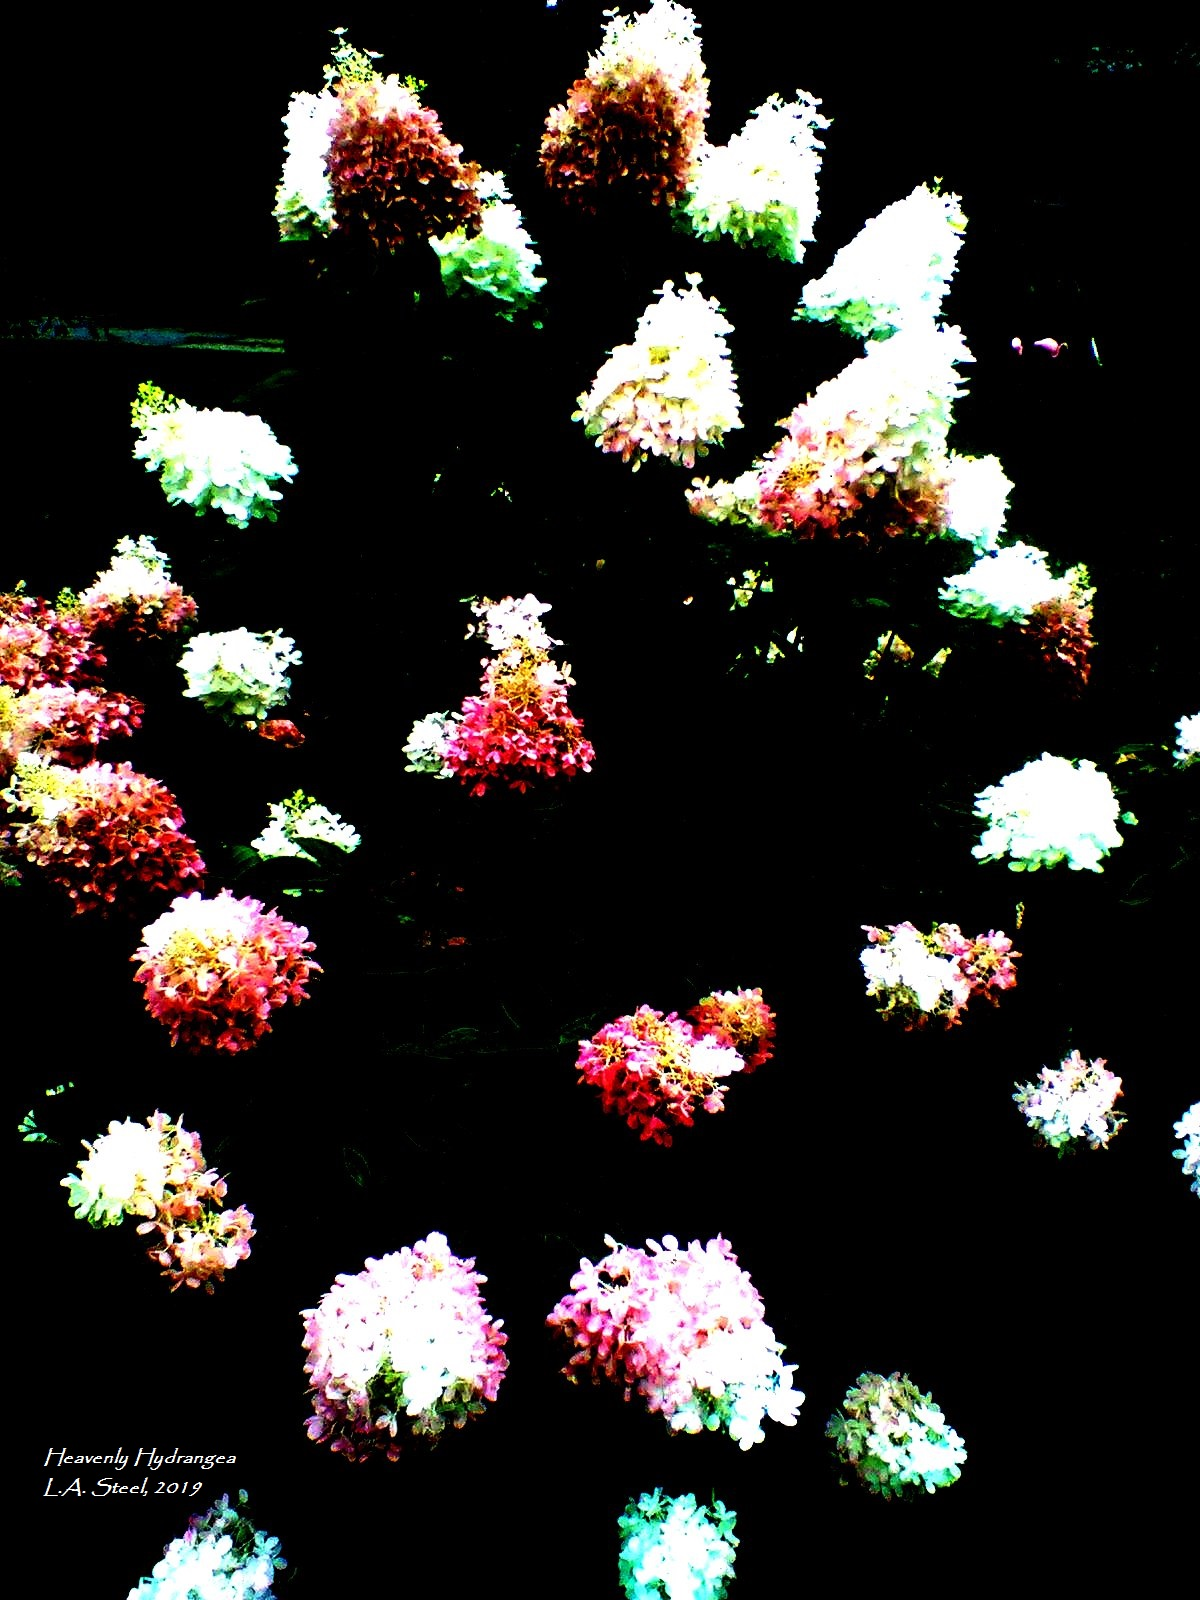 heavenly hydrangea 15 2019